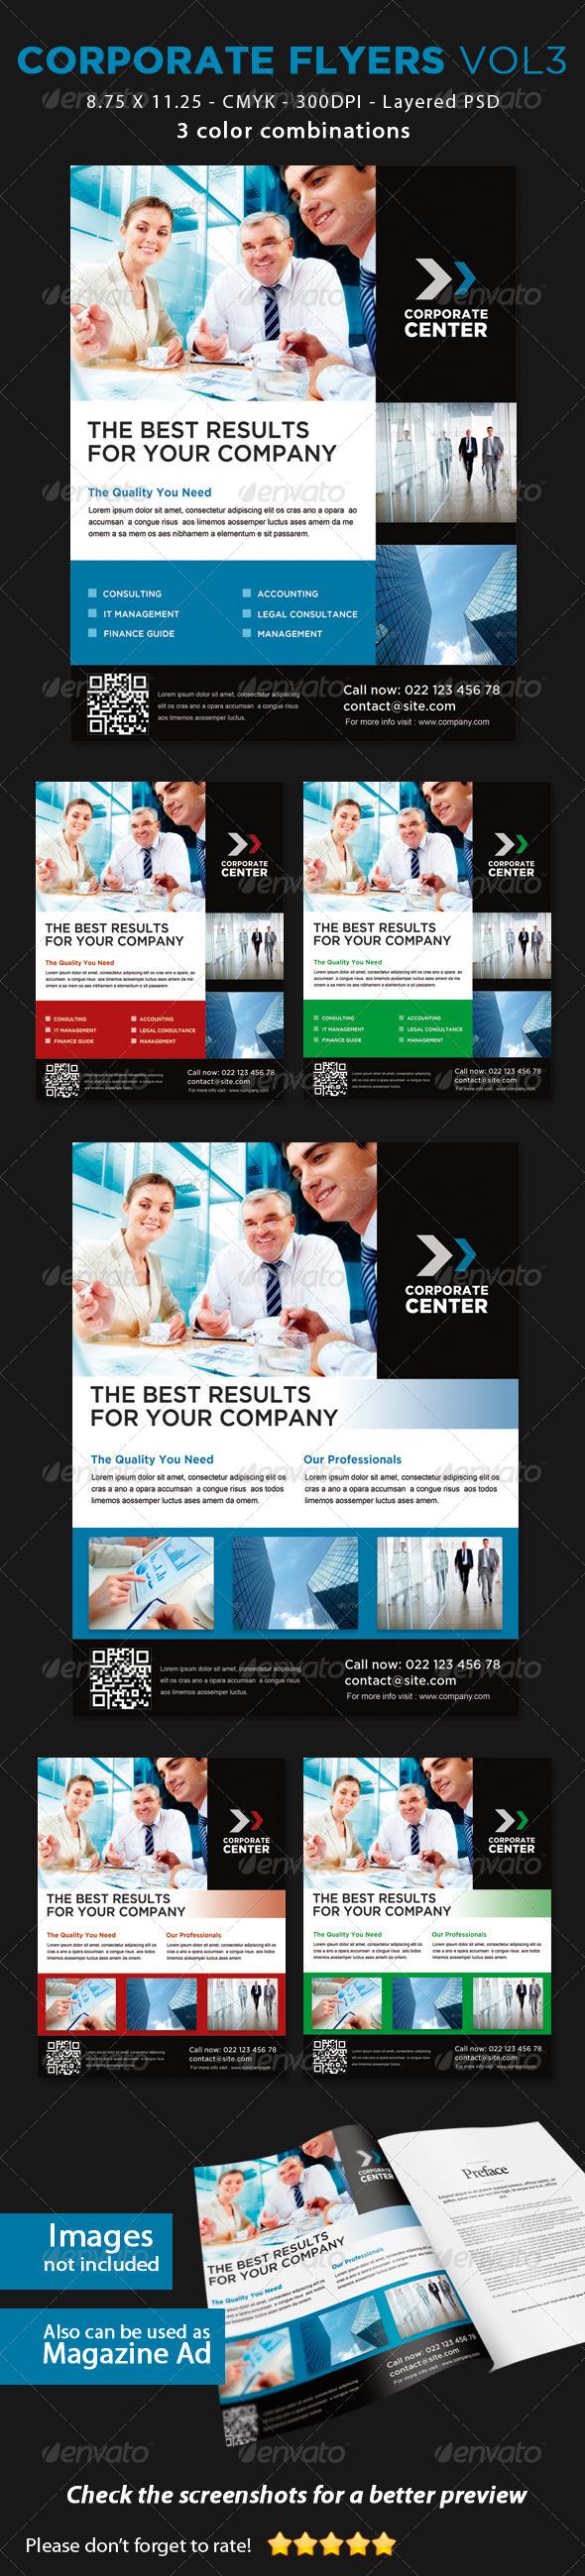 GraphicRiver Corporate Flyers Vol3 5840825